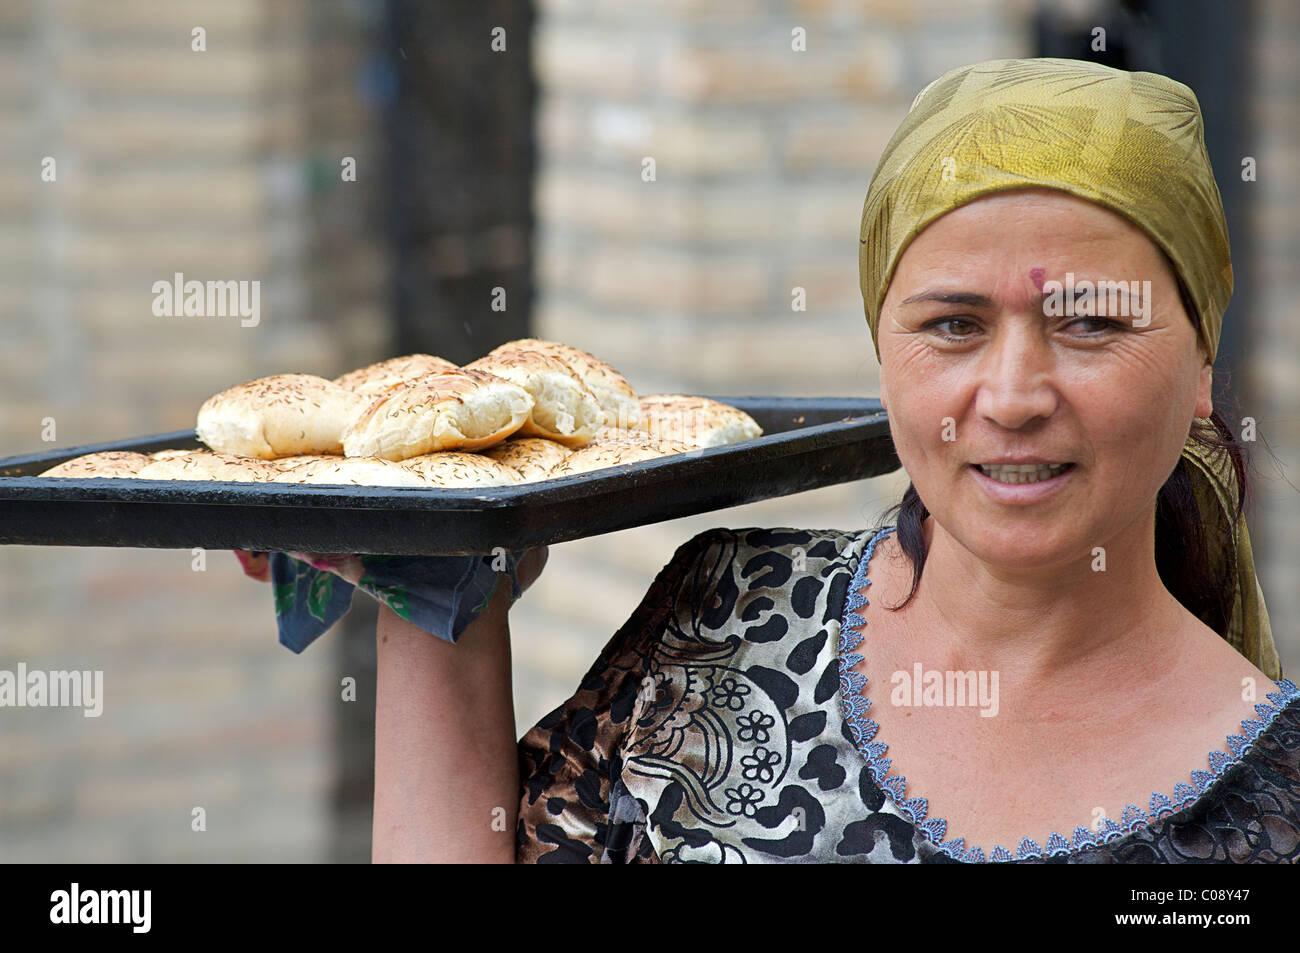 Itinerant Somsa vendor, Bukhara, Uzbekistan - Stock Image